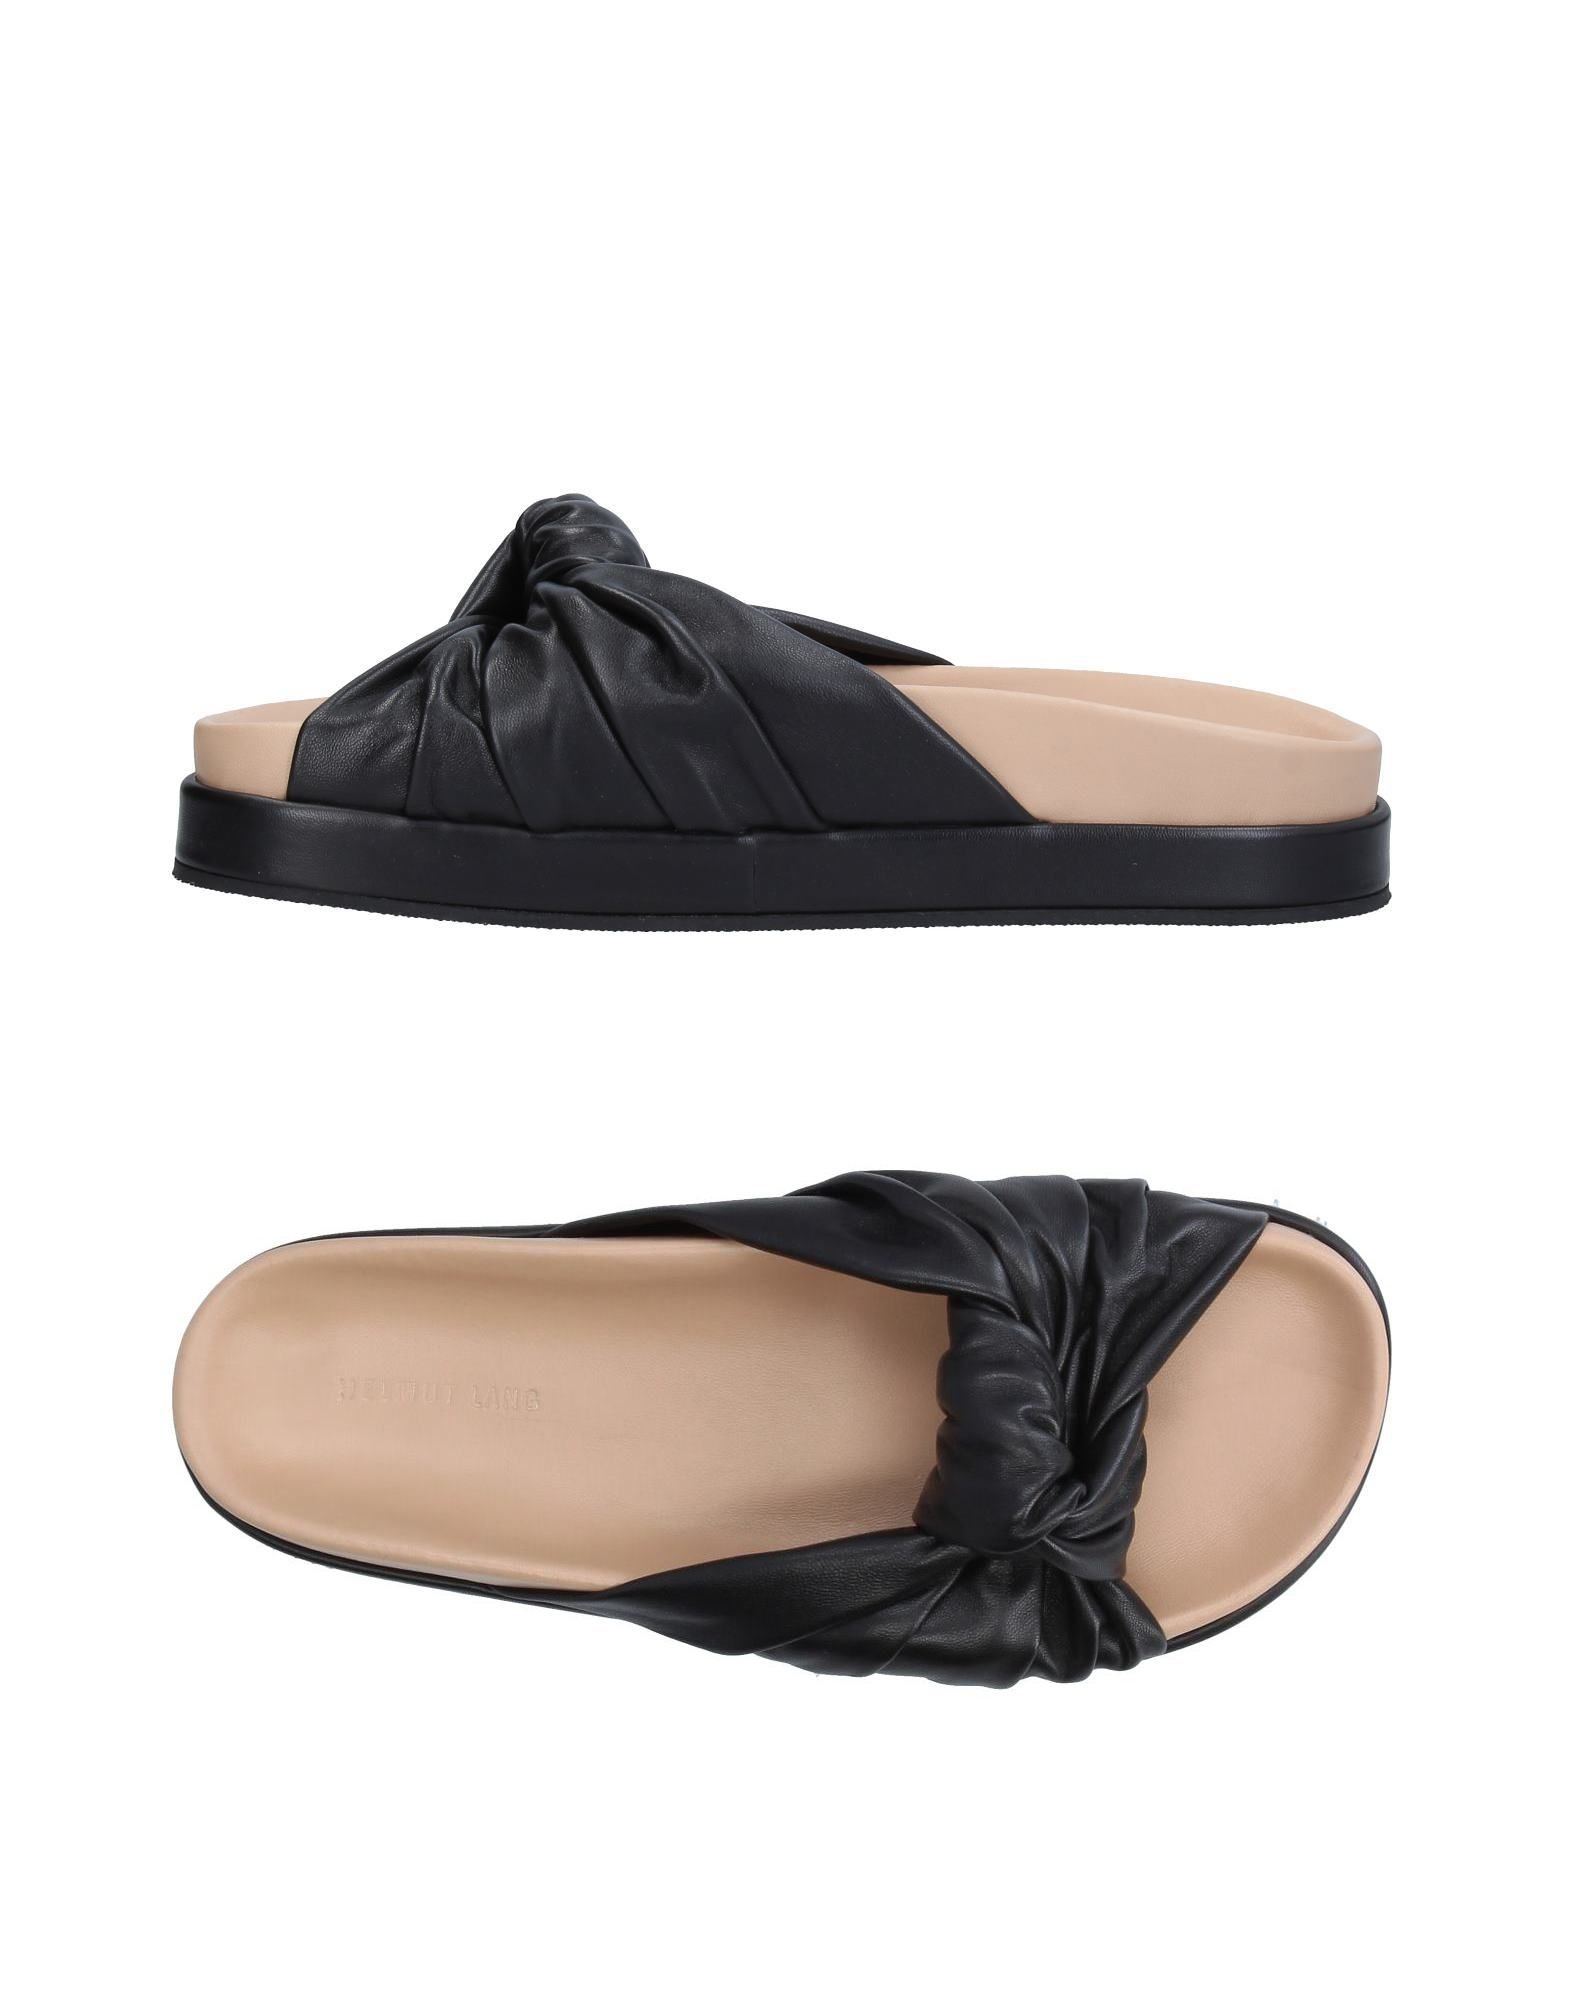 Helmut Lang Sandalen Damen  11337760FIGut aussehende strapazierfähige Schuhe